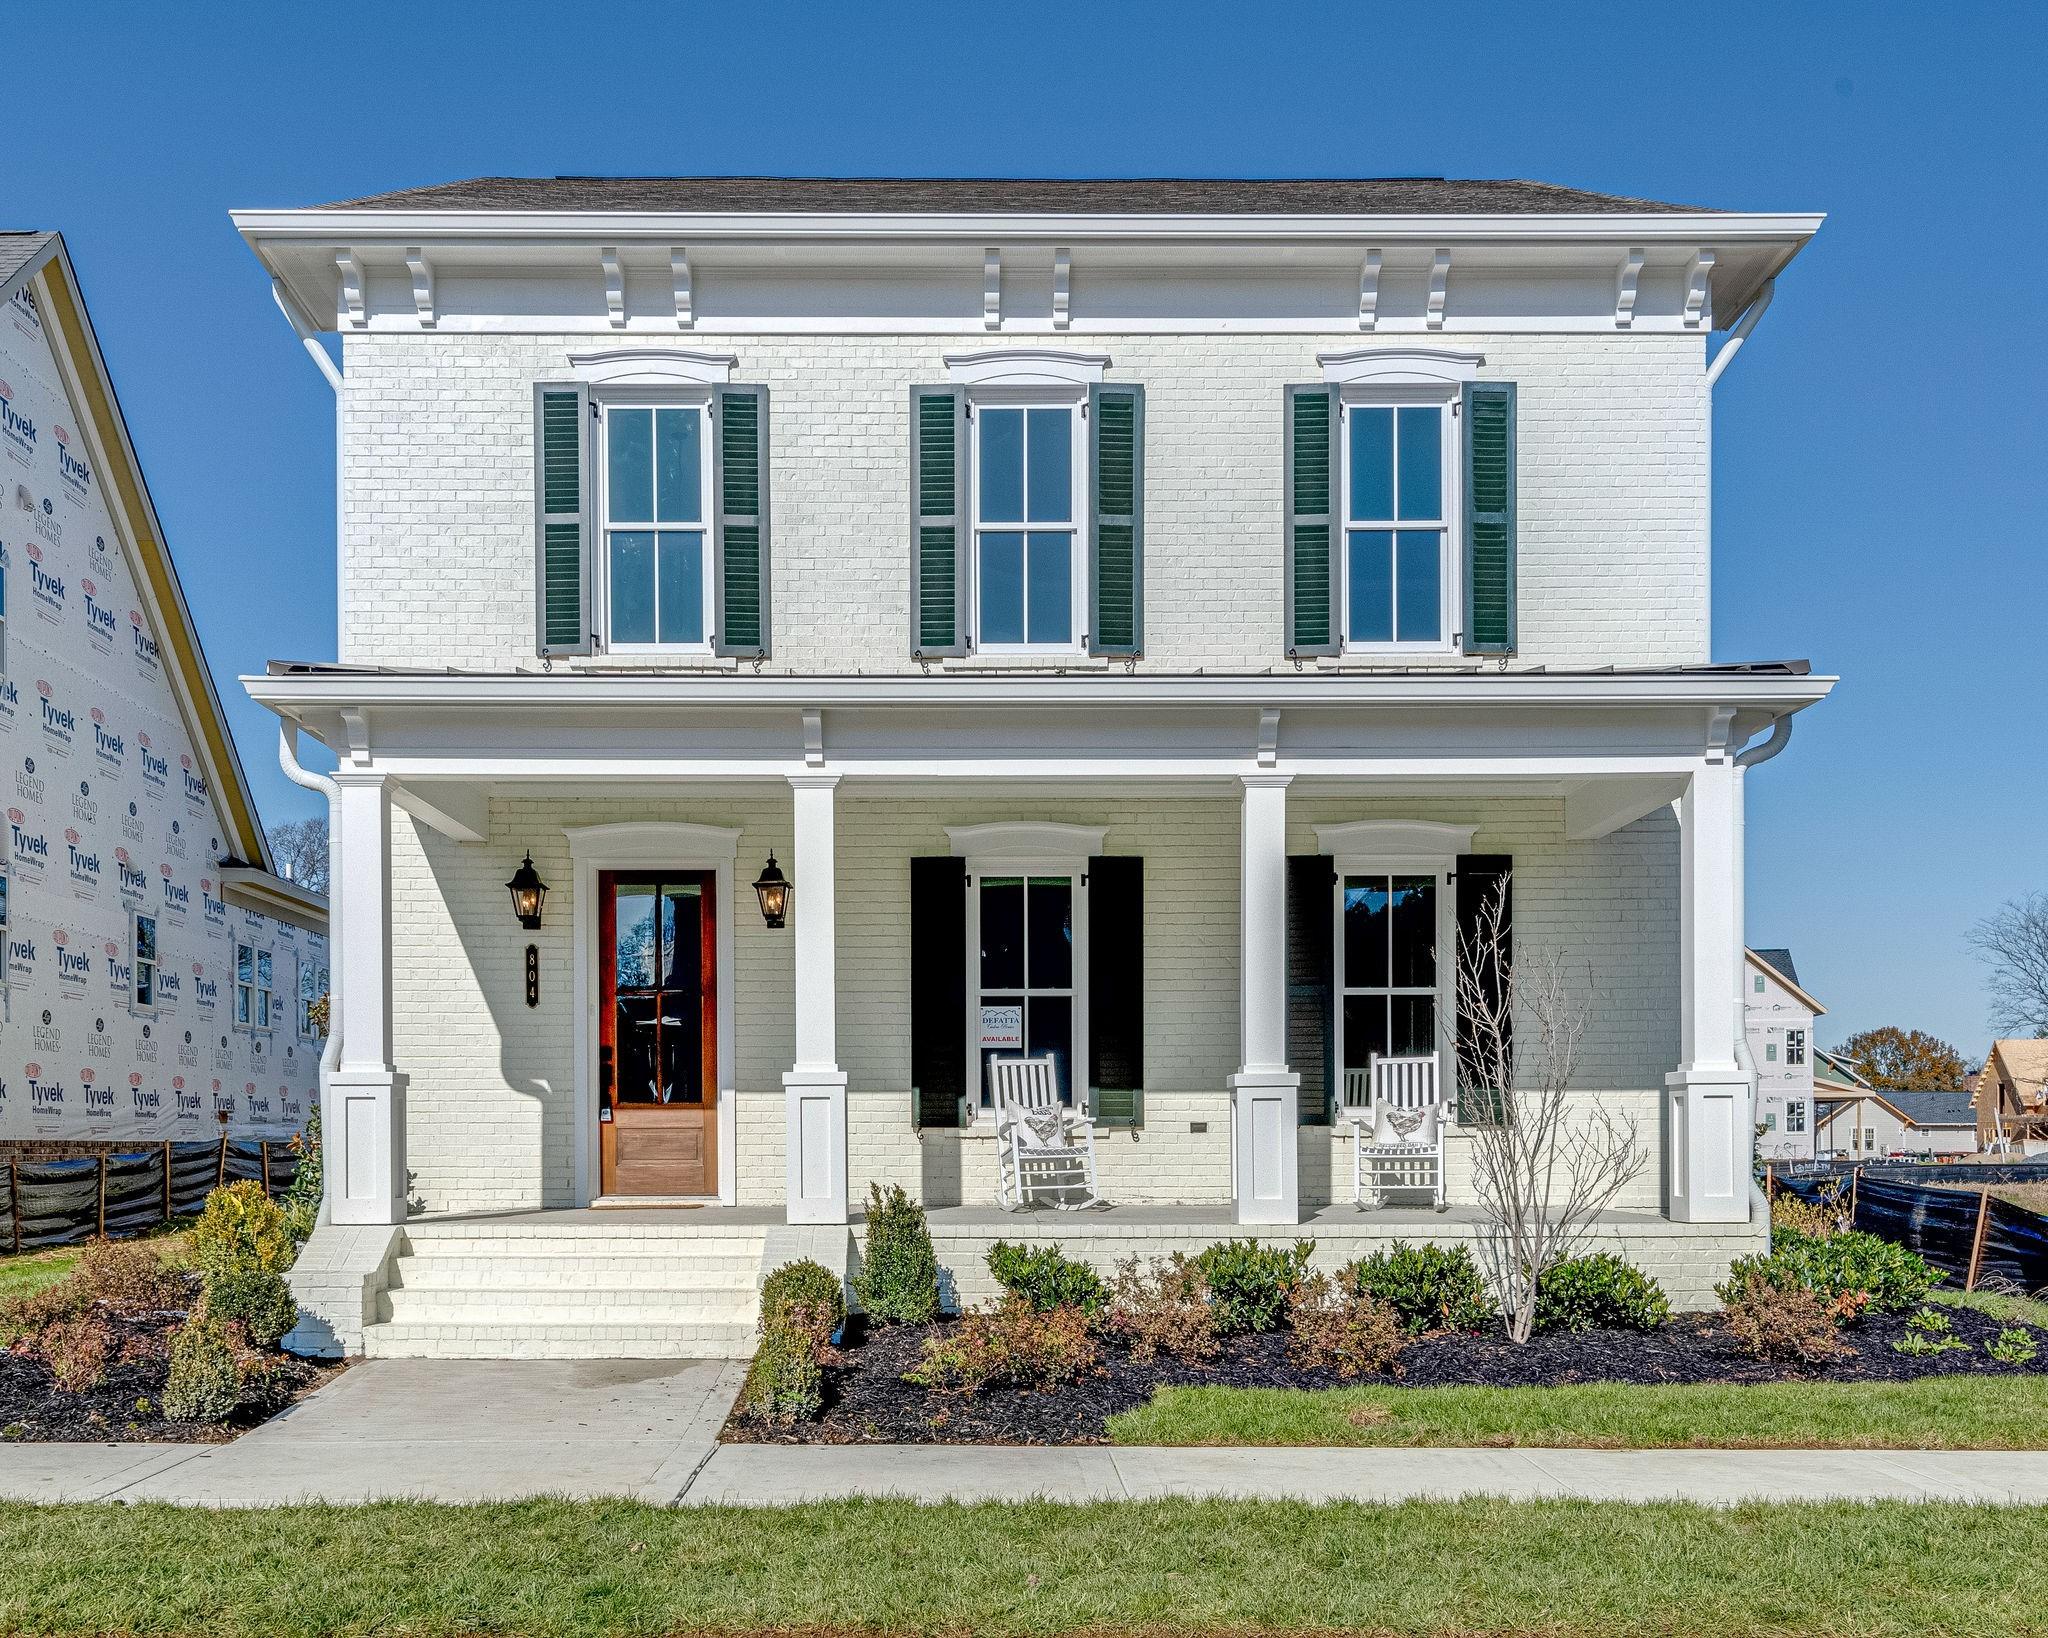 804 Carsten Street- Lot 214, Nashville, TN 37221 - Nashville, TN real estate listing